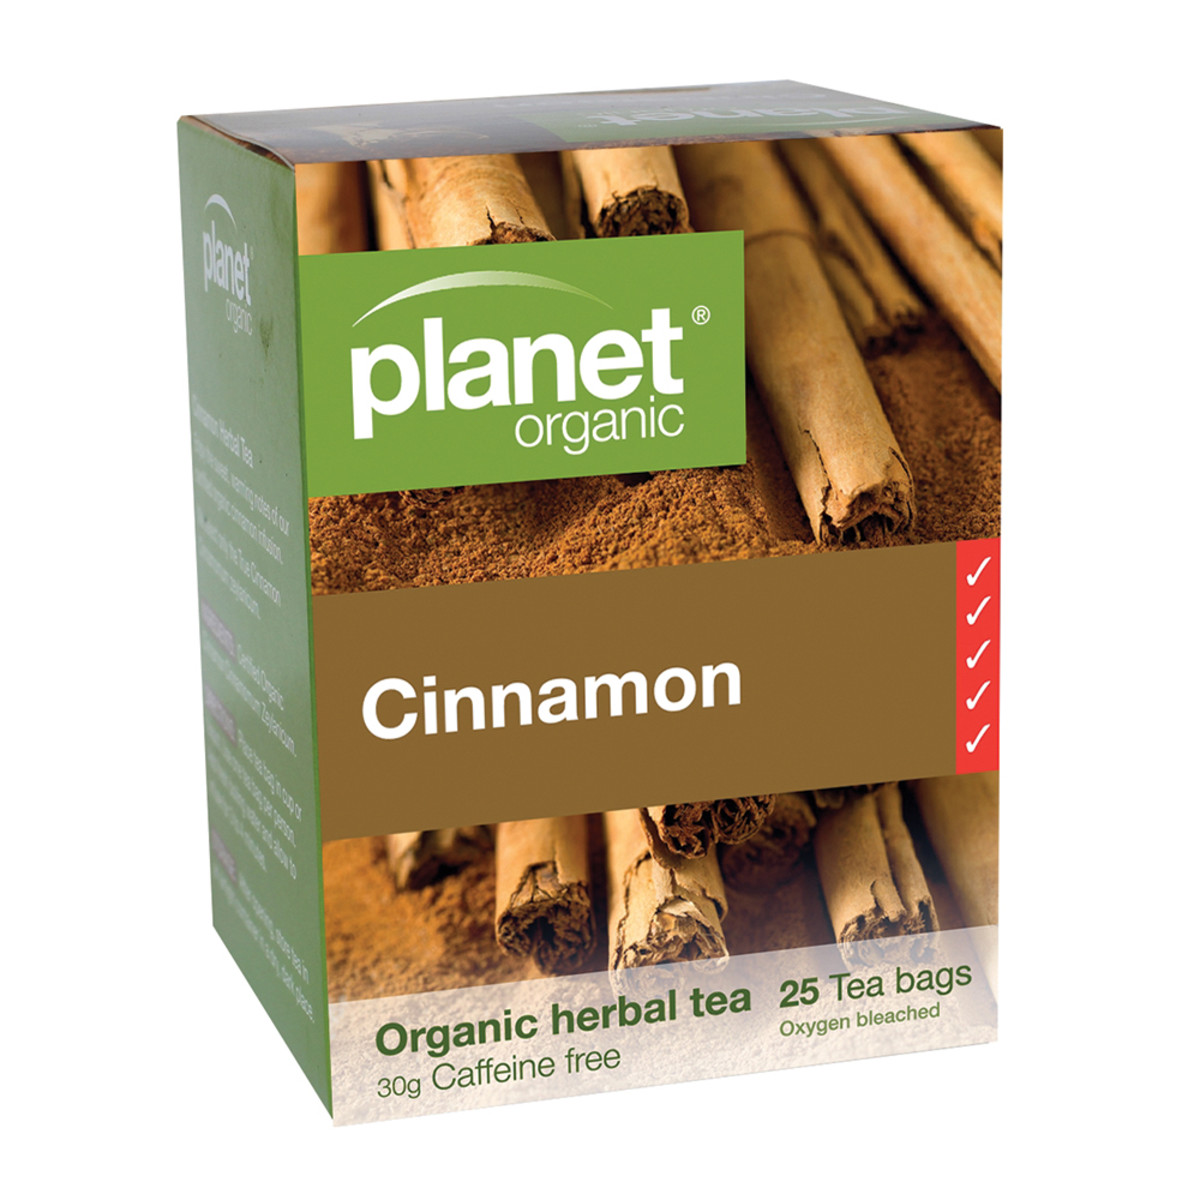 PLANET ORGANIC CINNAMON TEA ORG 25TB